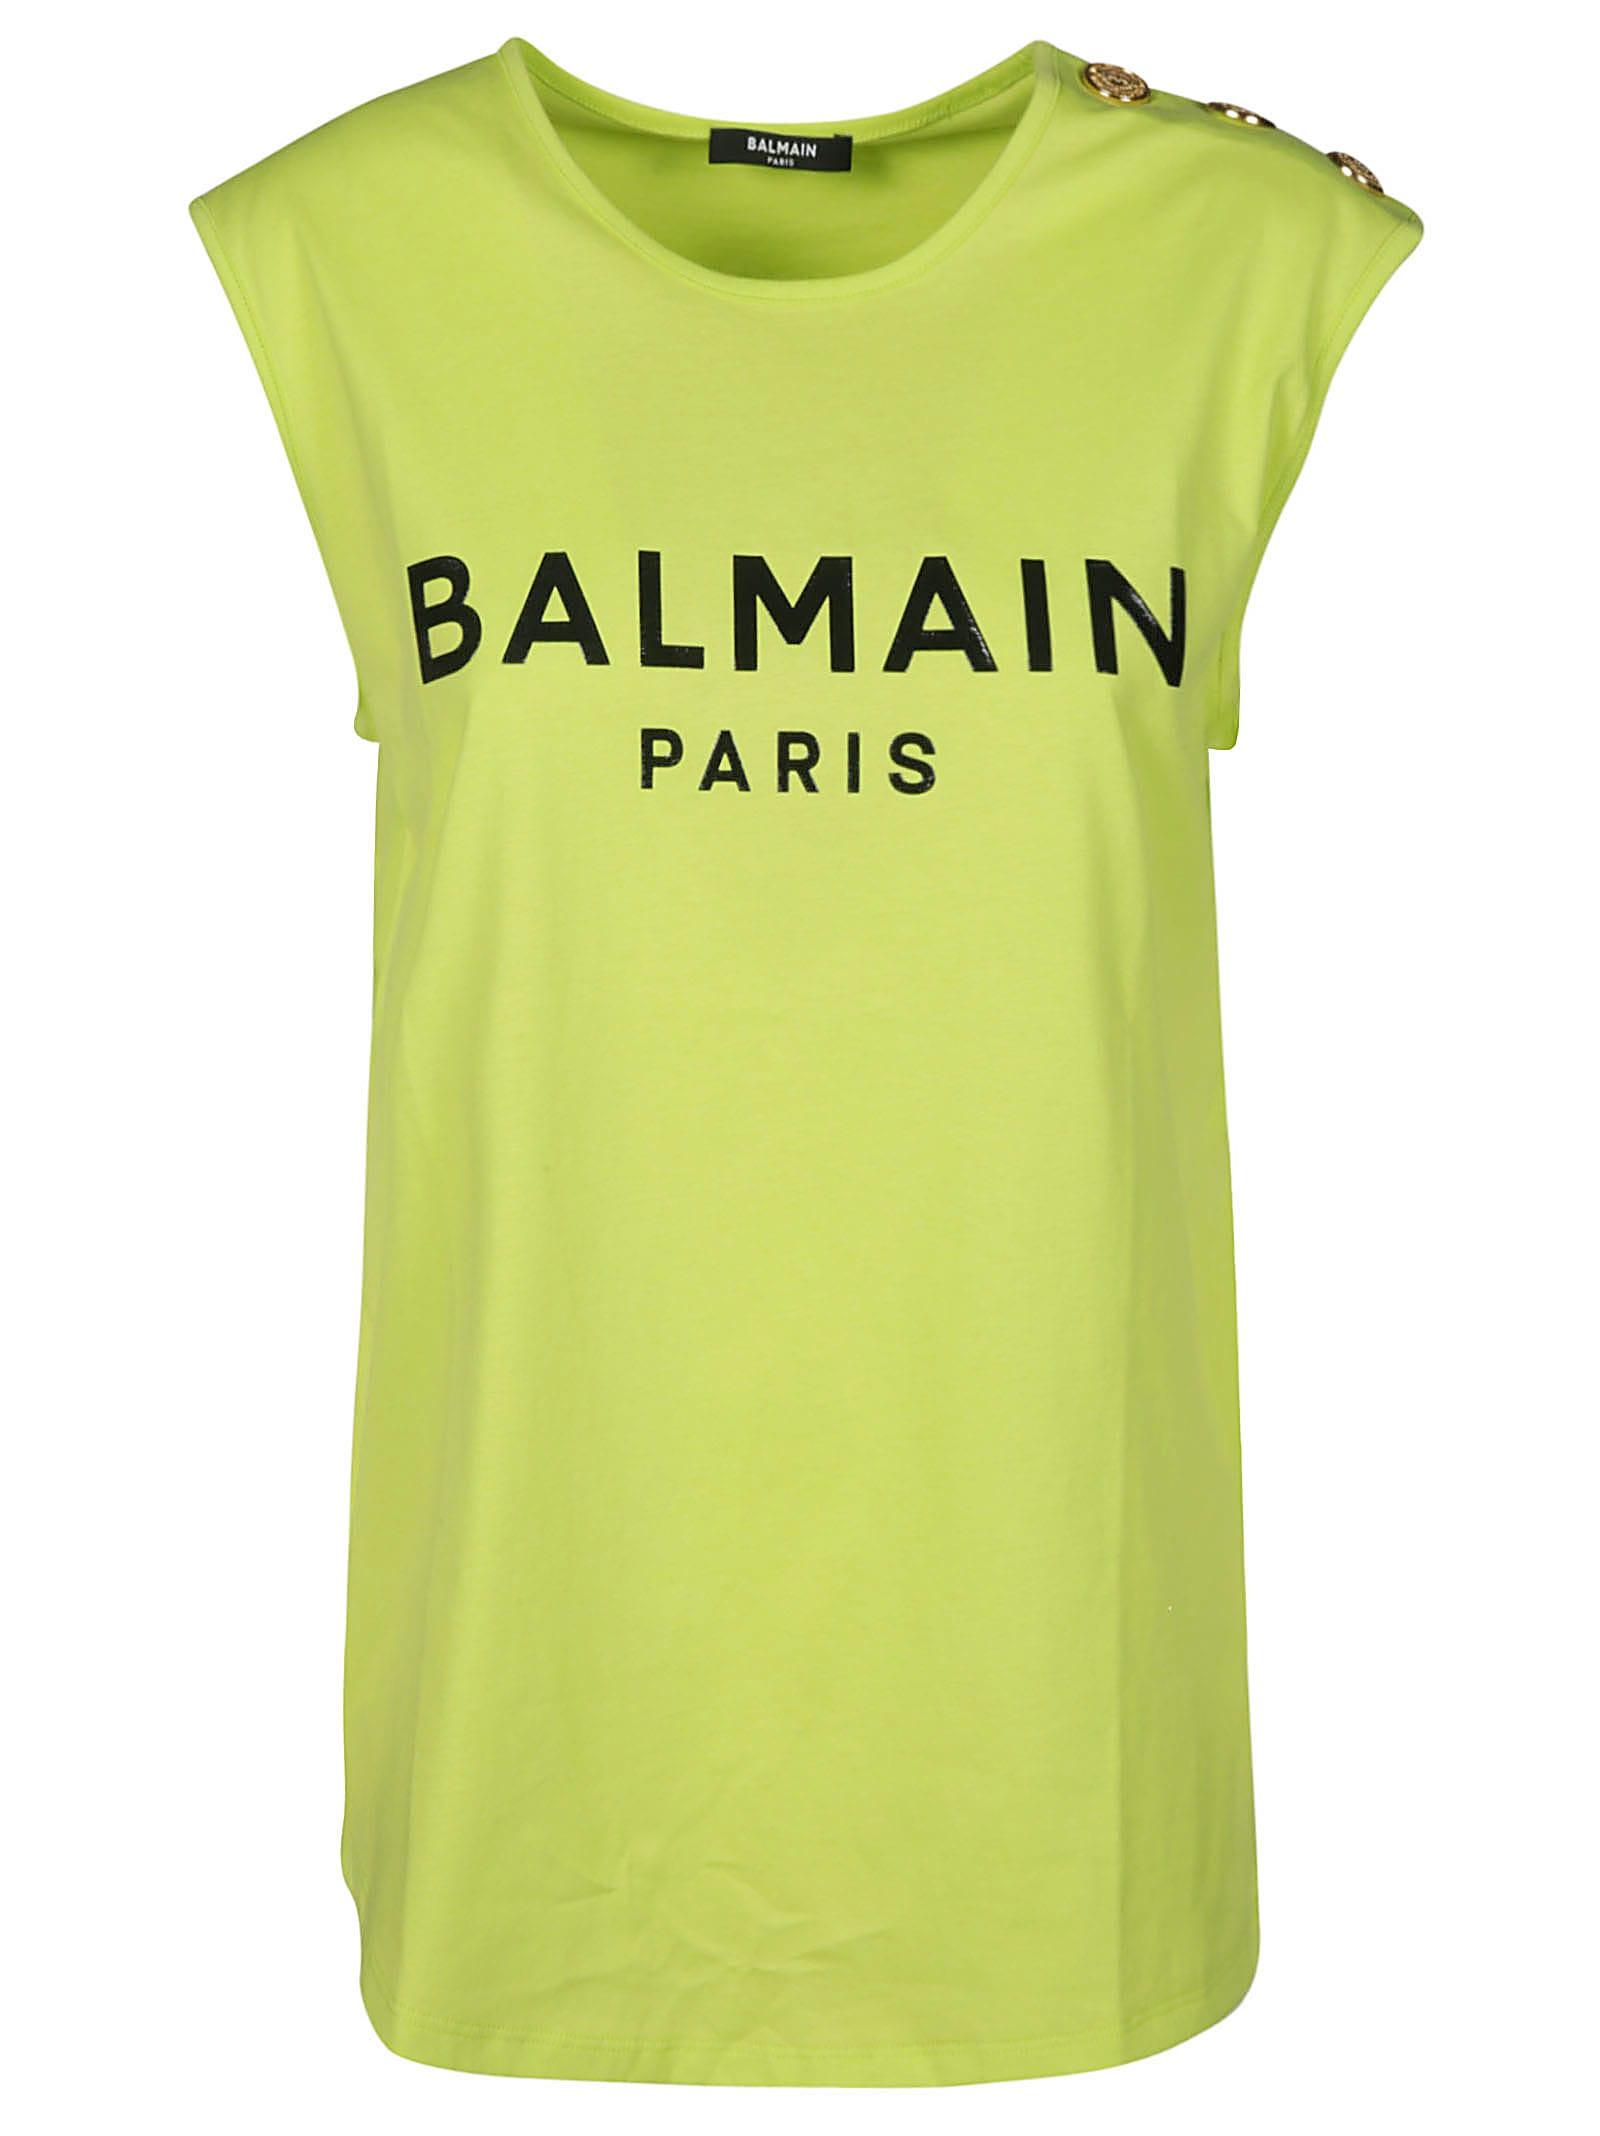 Balmain T-shirts BUTTON EMBELLISHED SLEEVELESS LOGO T-SHIRT